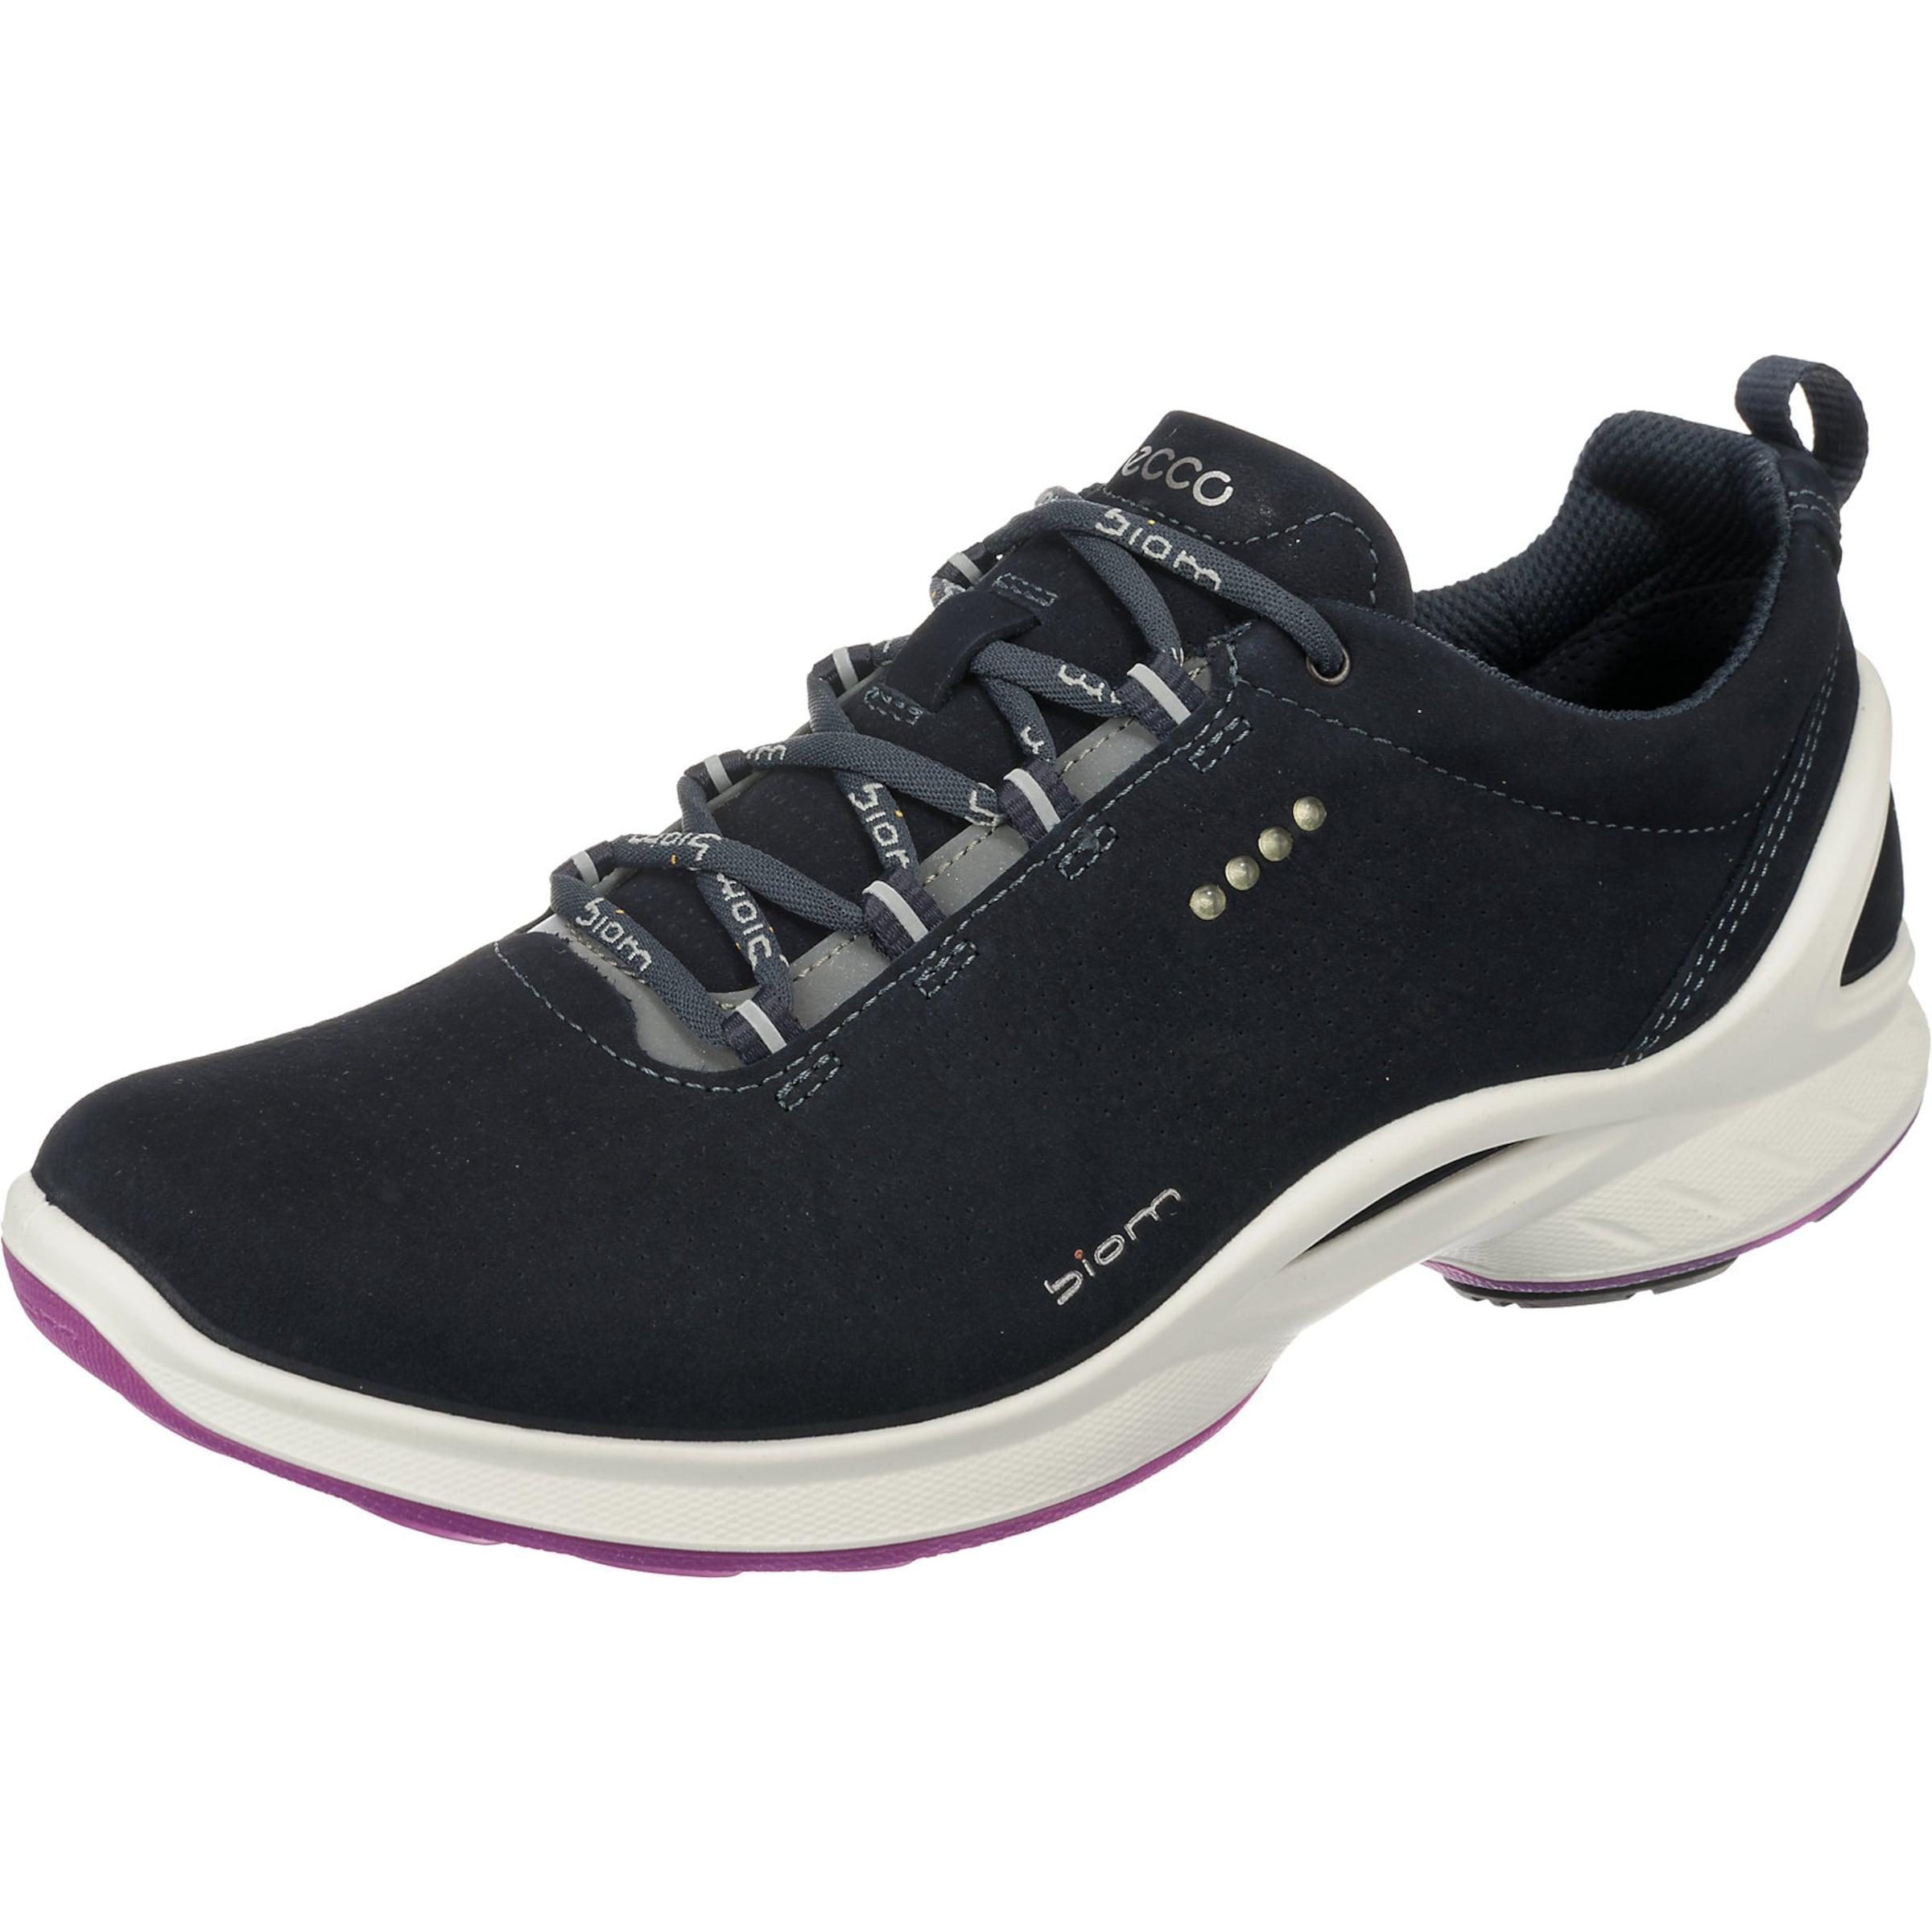 Ecco In Sneakers 'biom Yak' Yabuck Fjuel Navy OXn0wk8NPZ